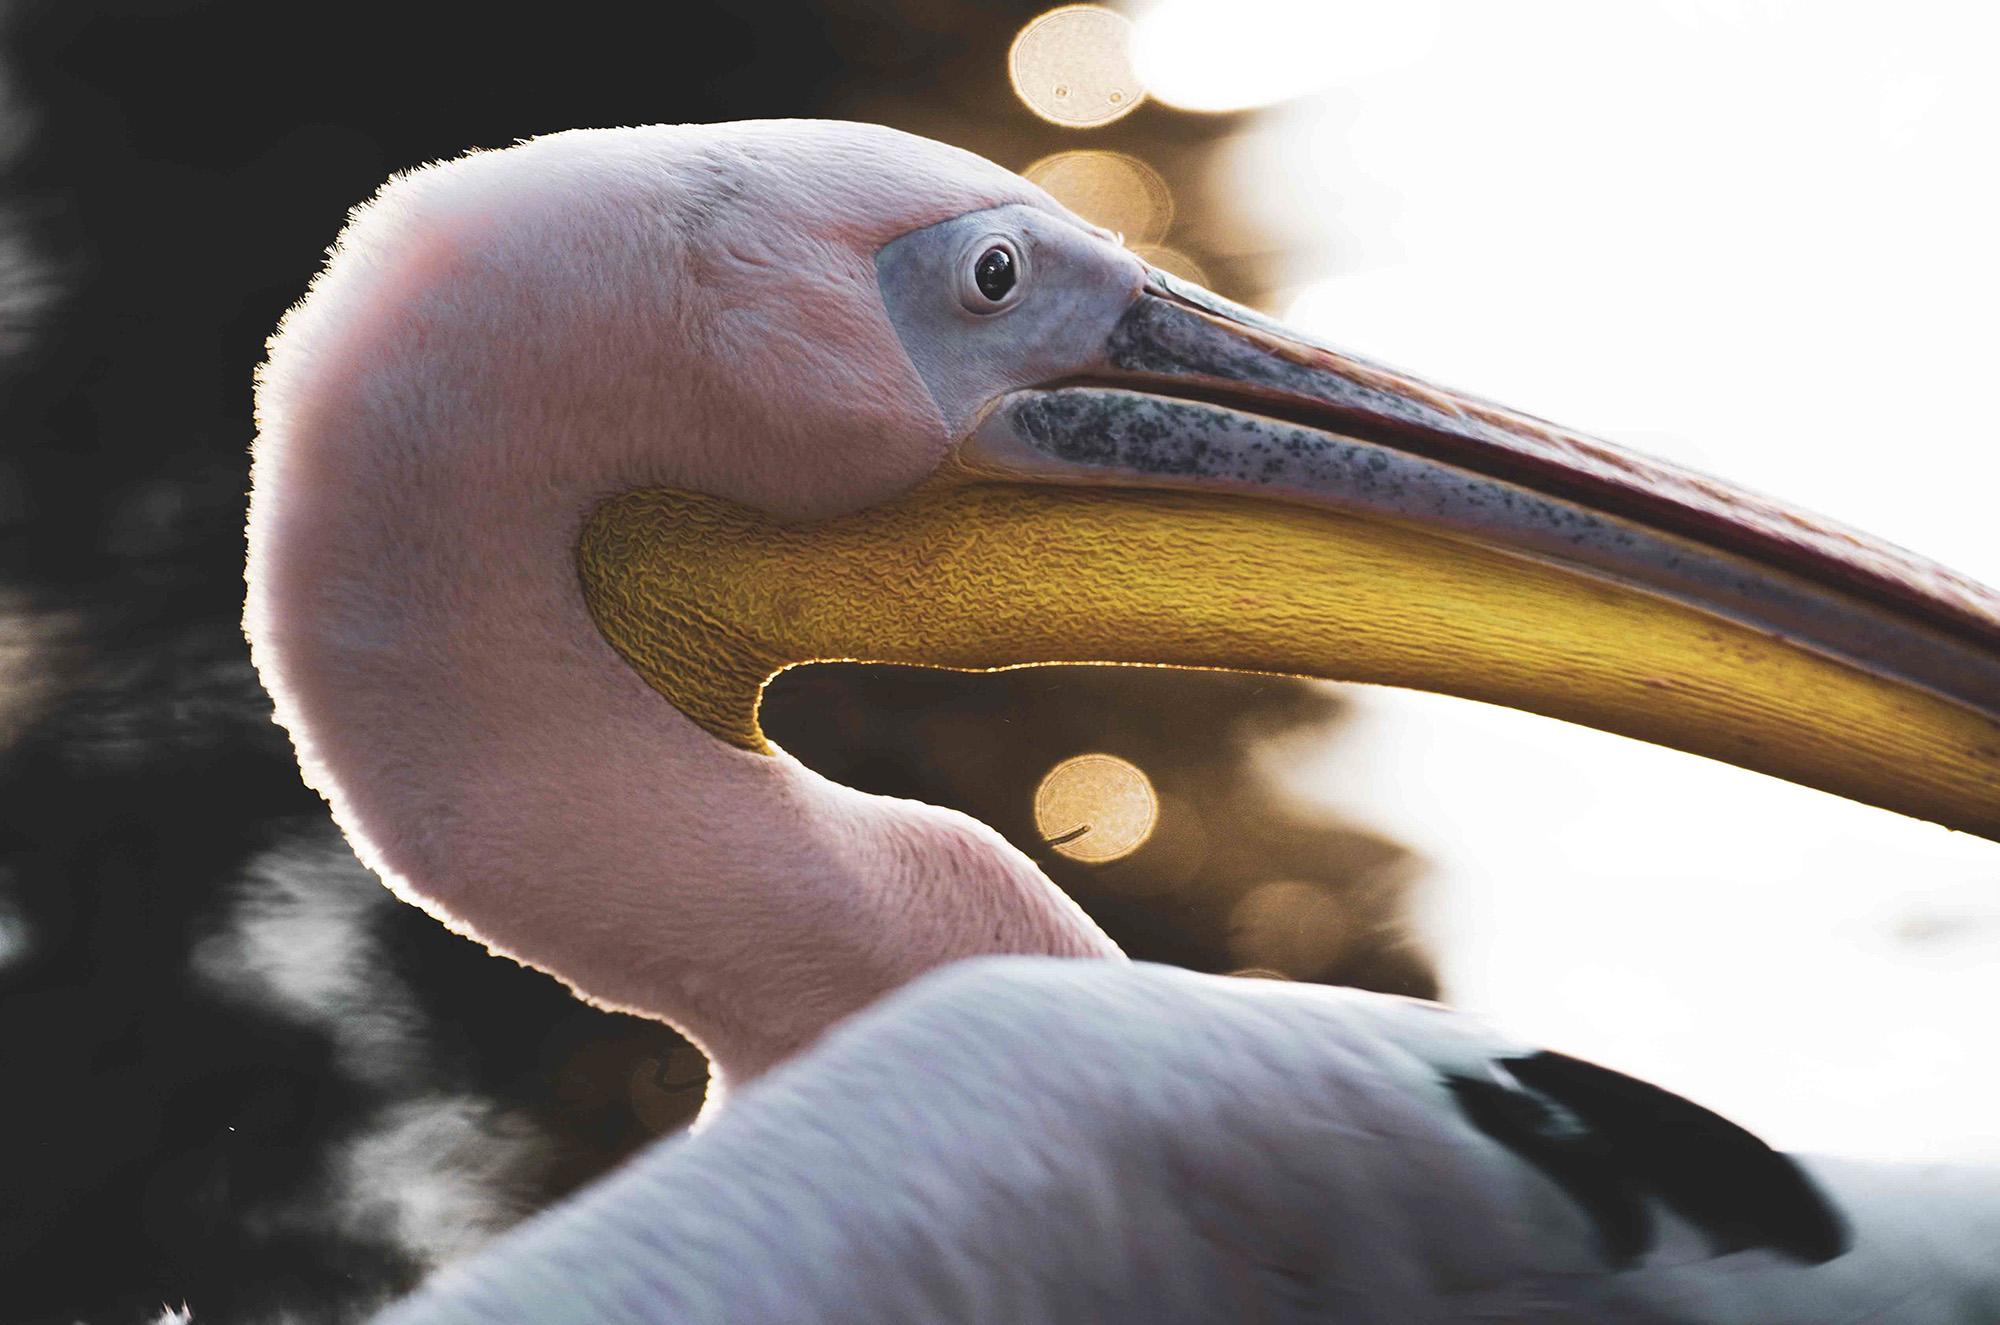 Animal, Wild life, Siehu-Photograpohy